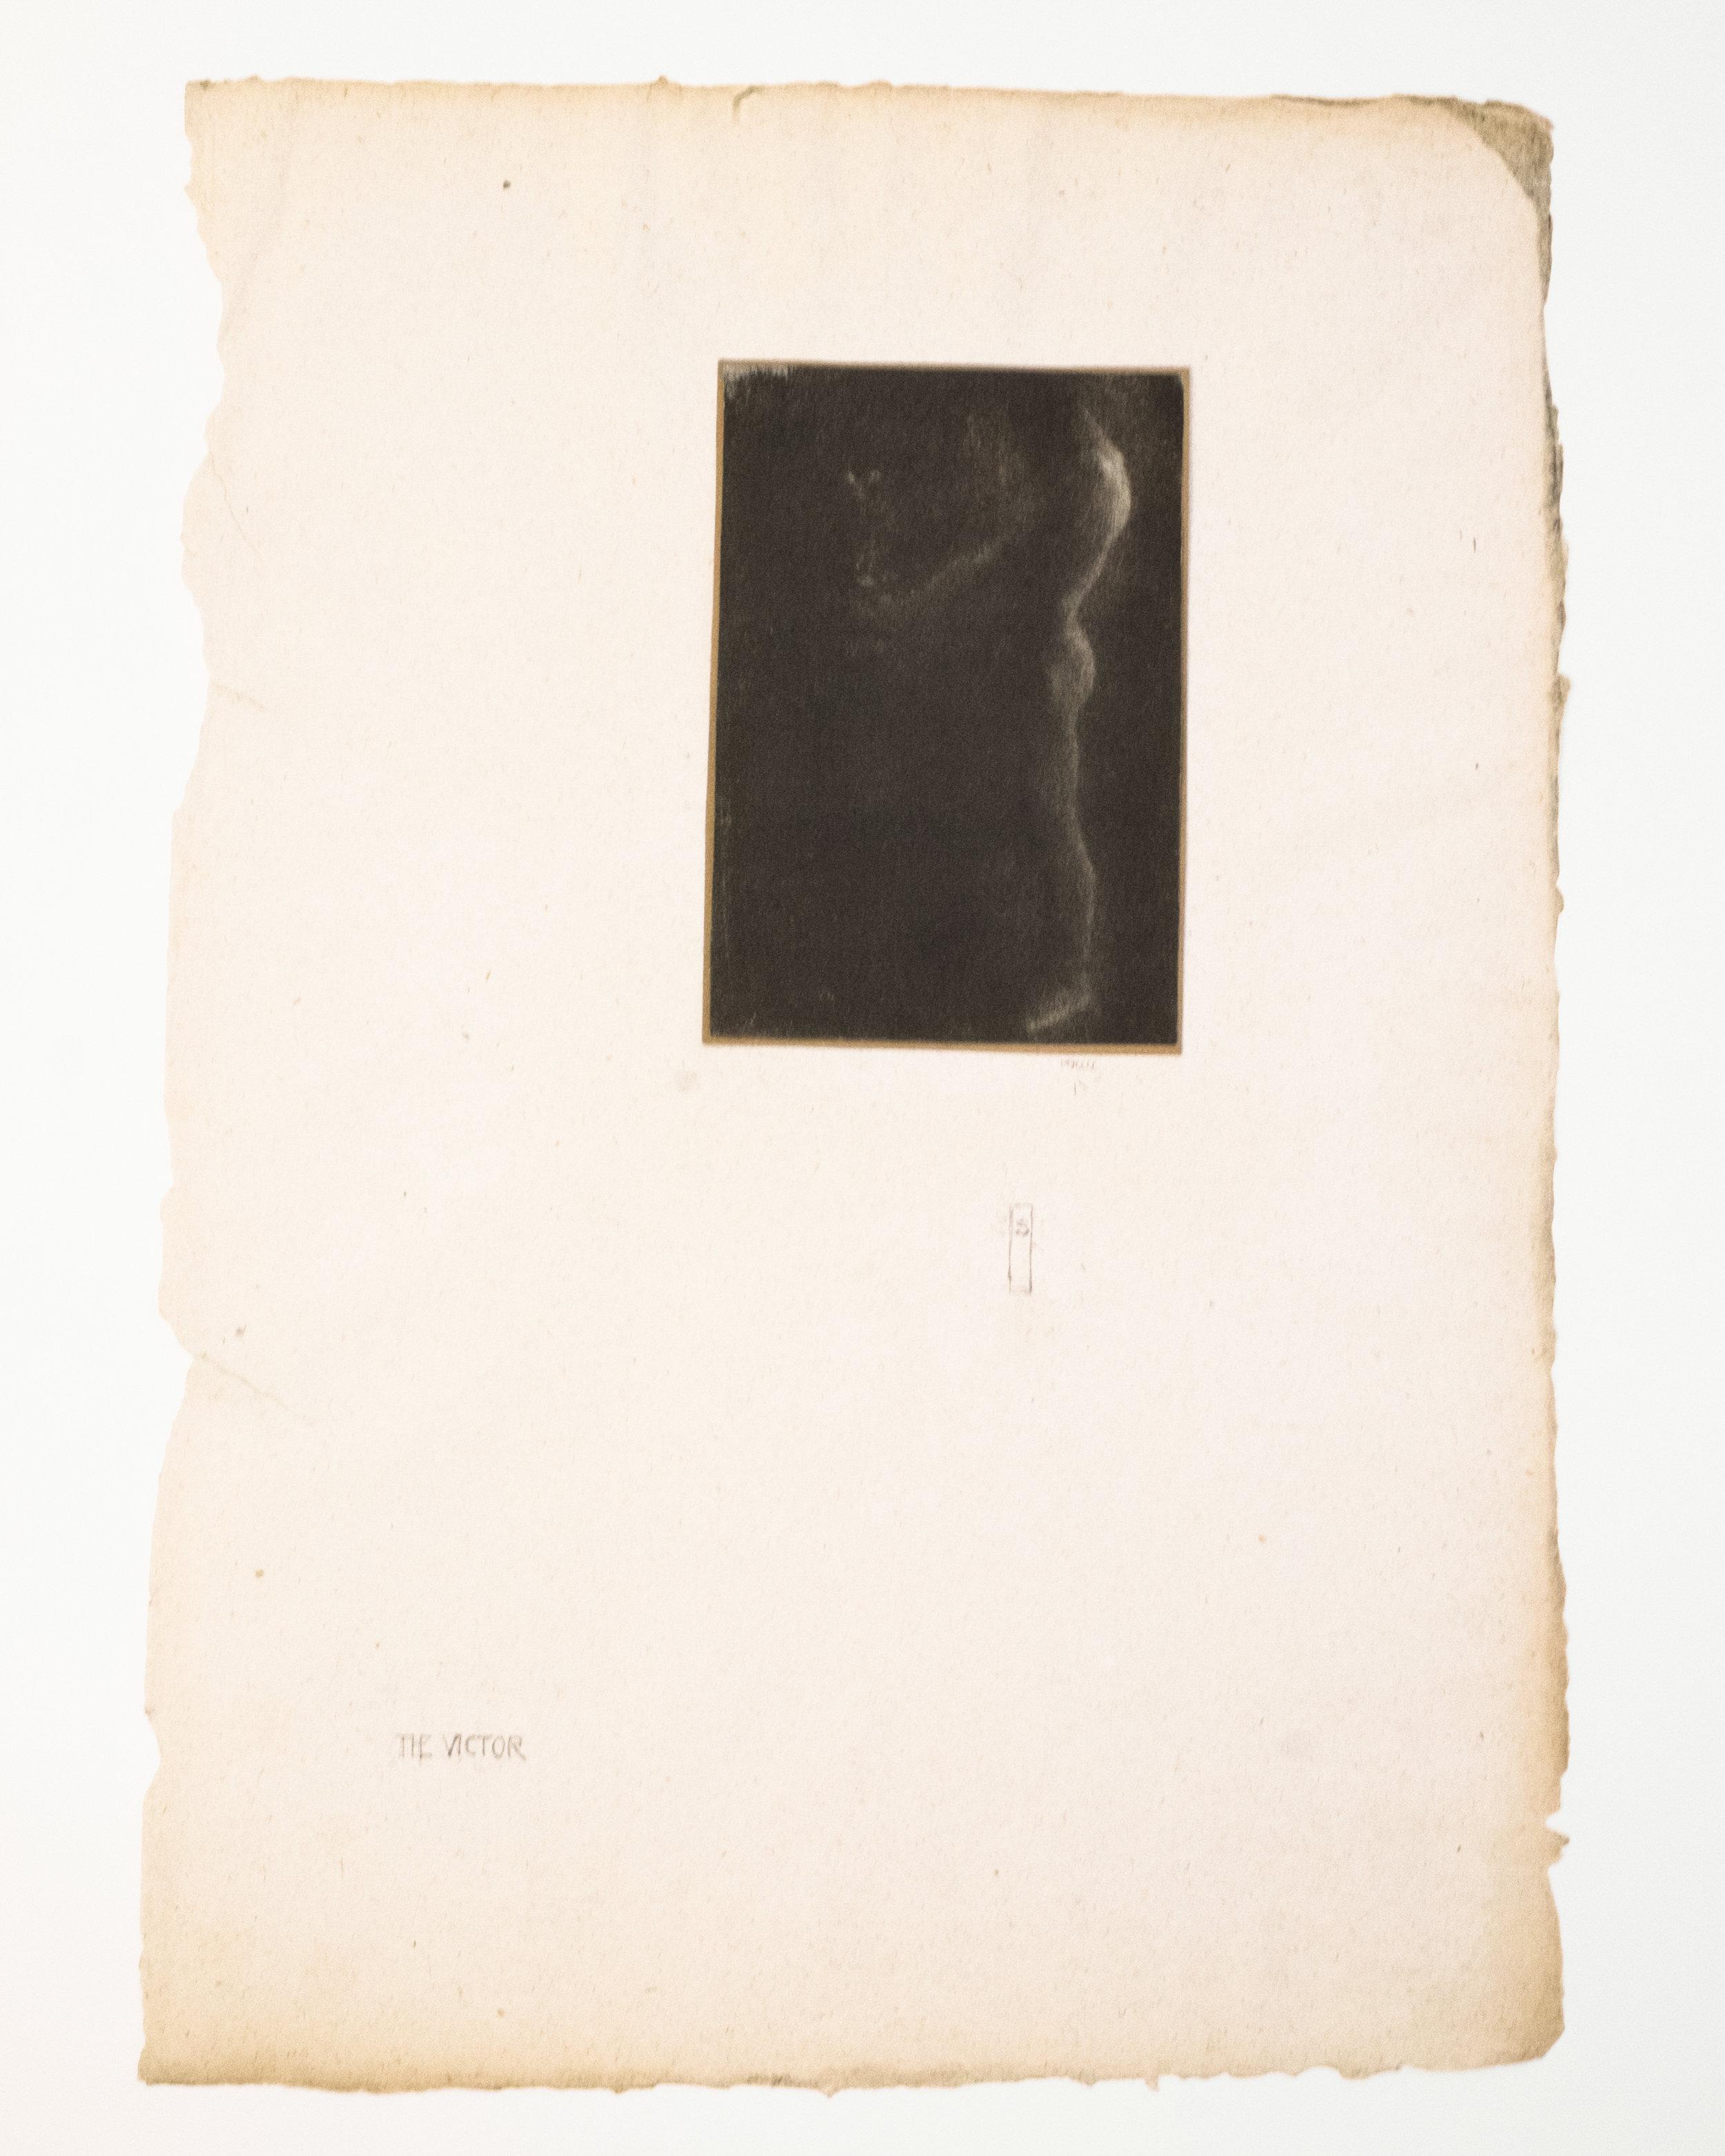 Edward Steichen's  Victor , courtesy of the Howard Greenberg Gallery